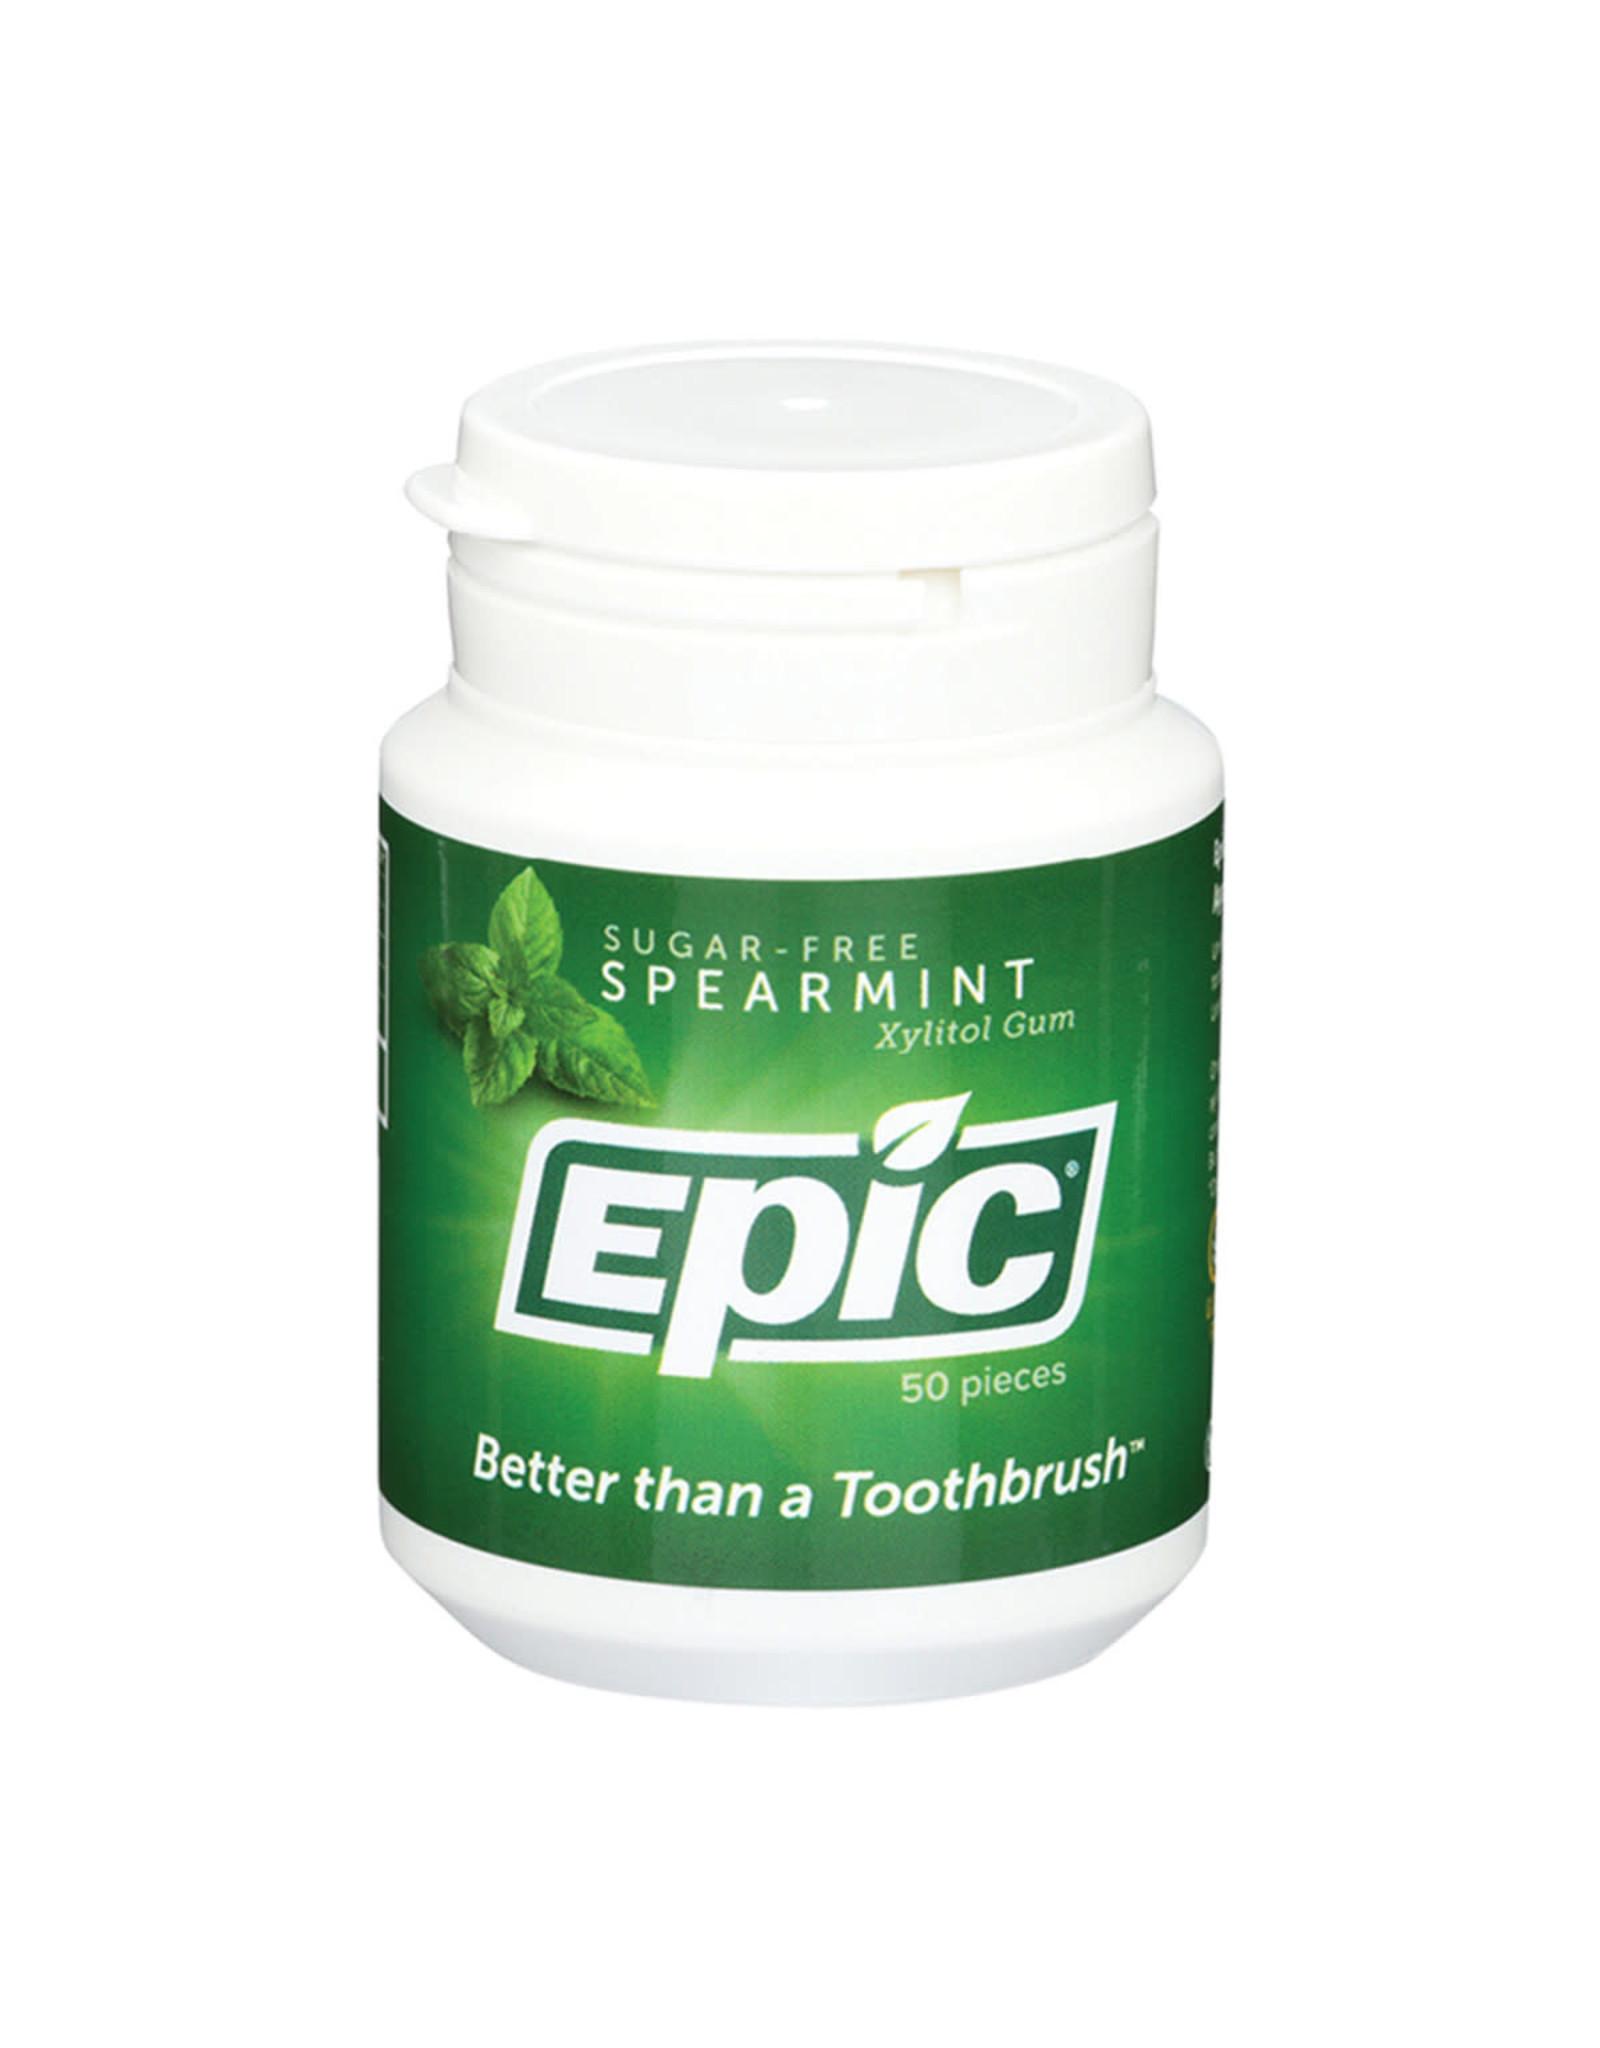 Epic Xylitol Dental Gum Spearmint 50pc Tub